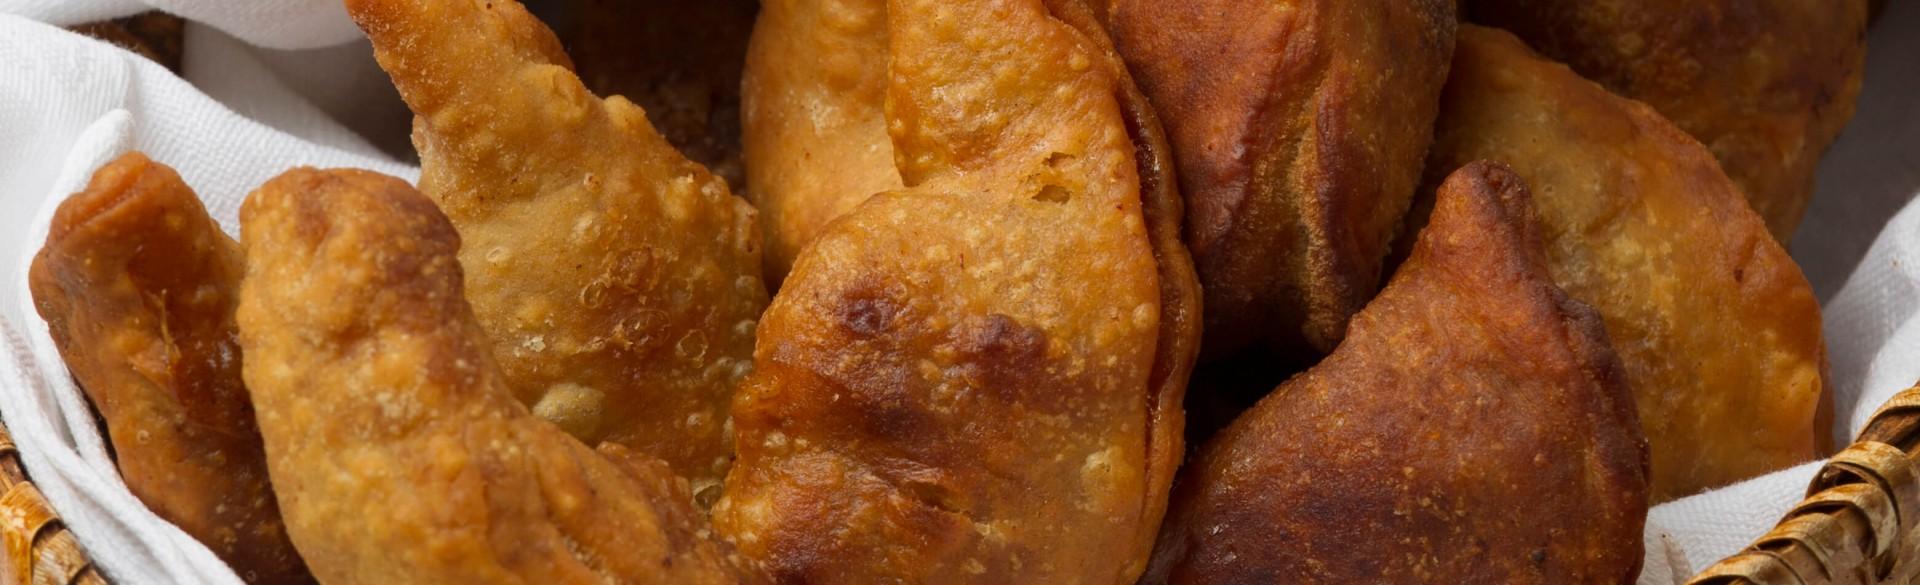 Pastel de Afogado da Boda (Traditional goat stew pastry)